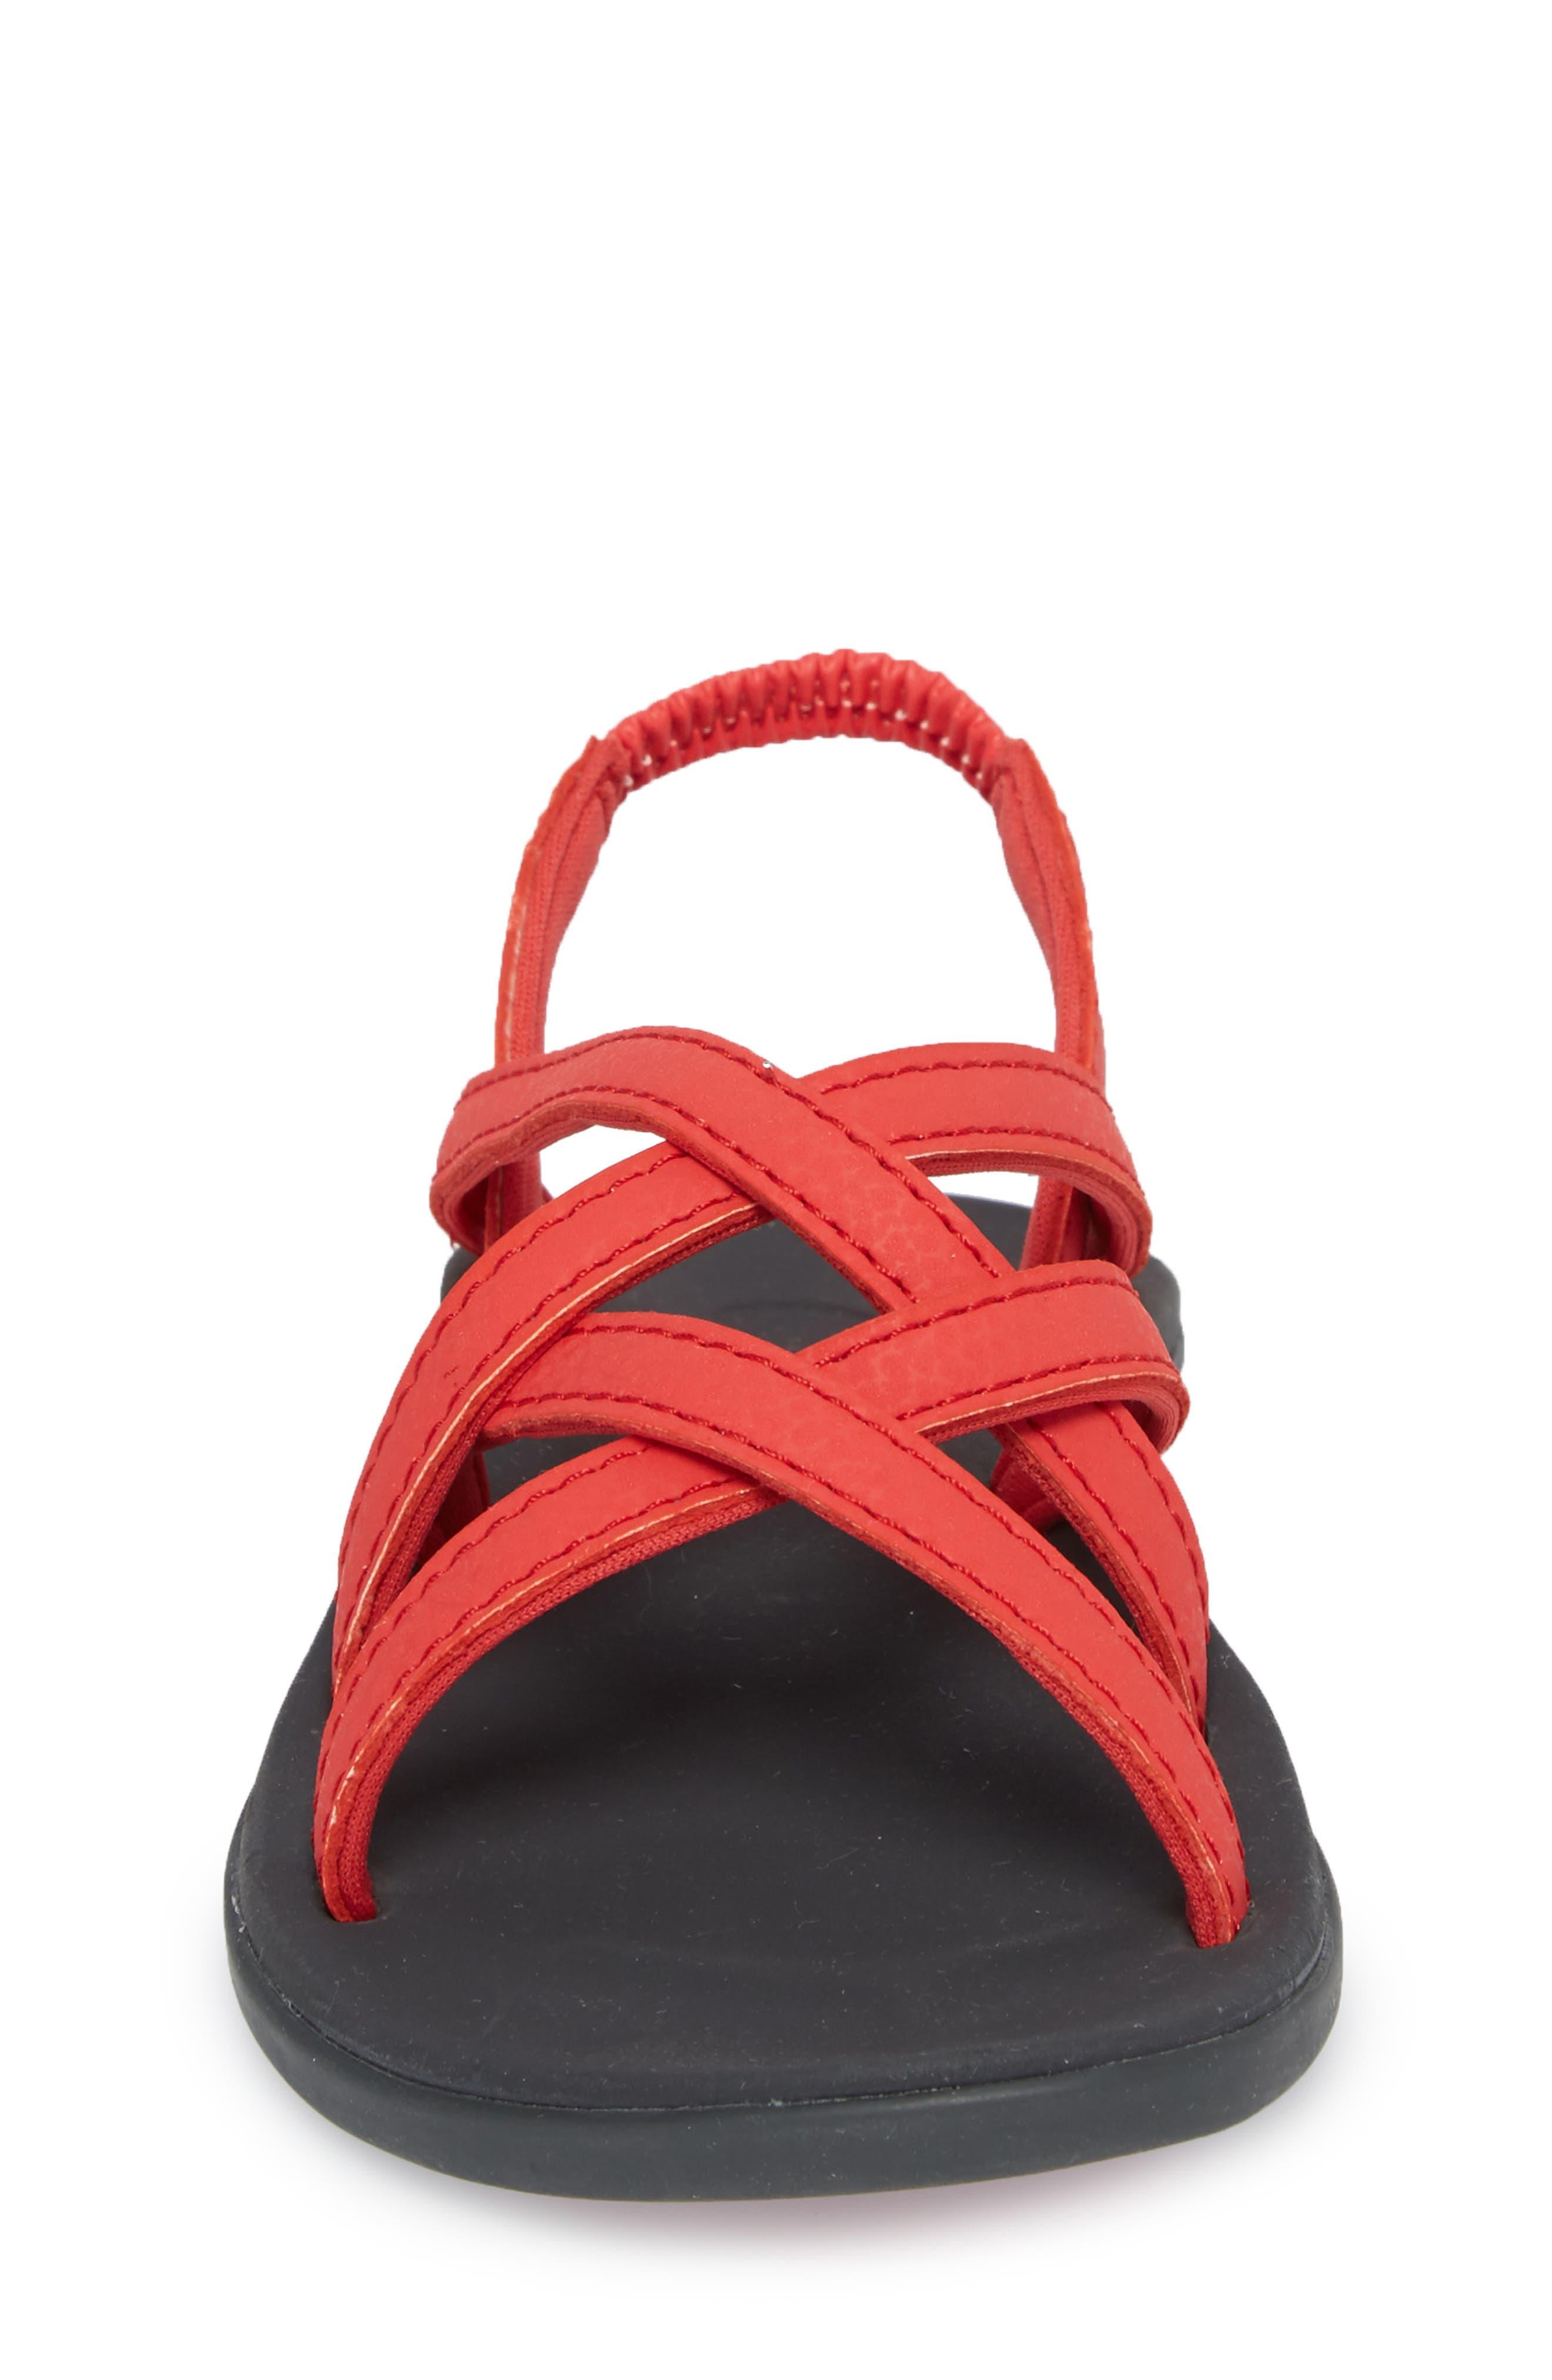 Kalapu Sandal,                             Alternate thumbnail 4, color,                             HIBISCUS/ DARK SHADOW